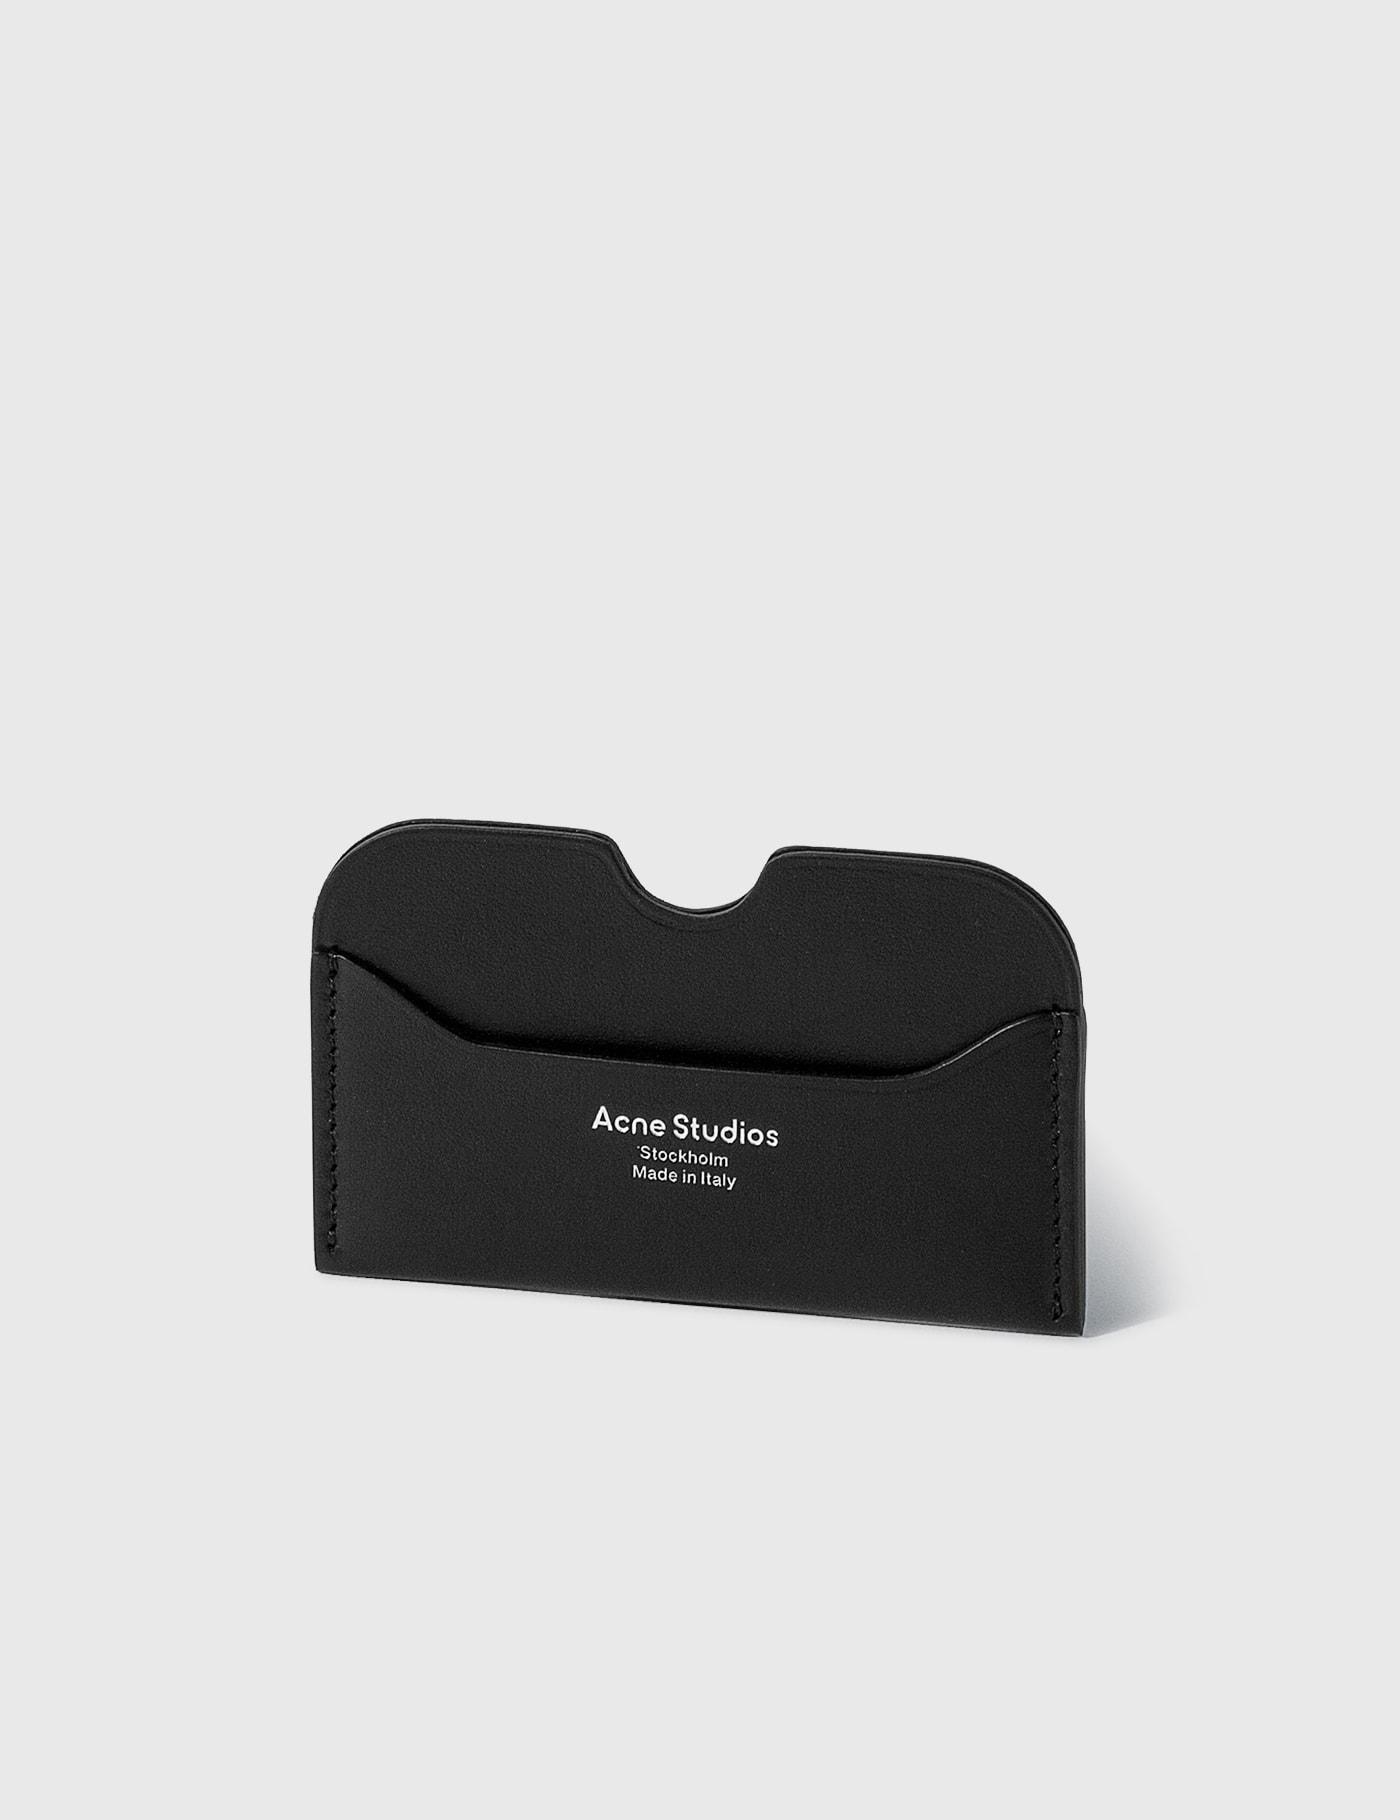 Acne Studios Cardholders ELMAS S CARD HOLDER